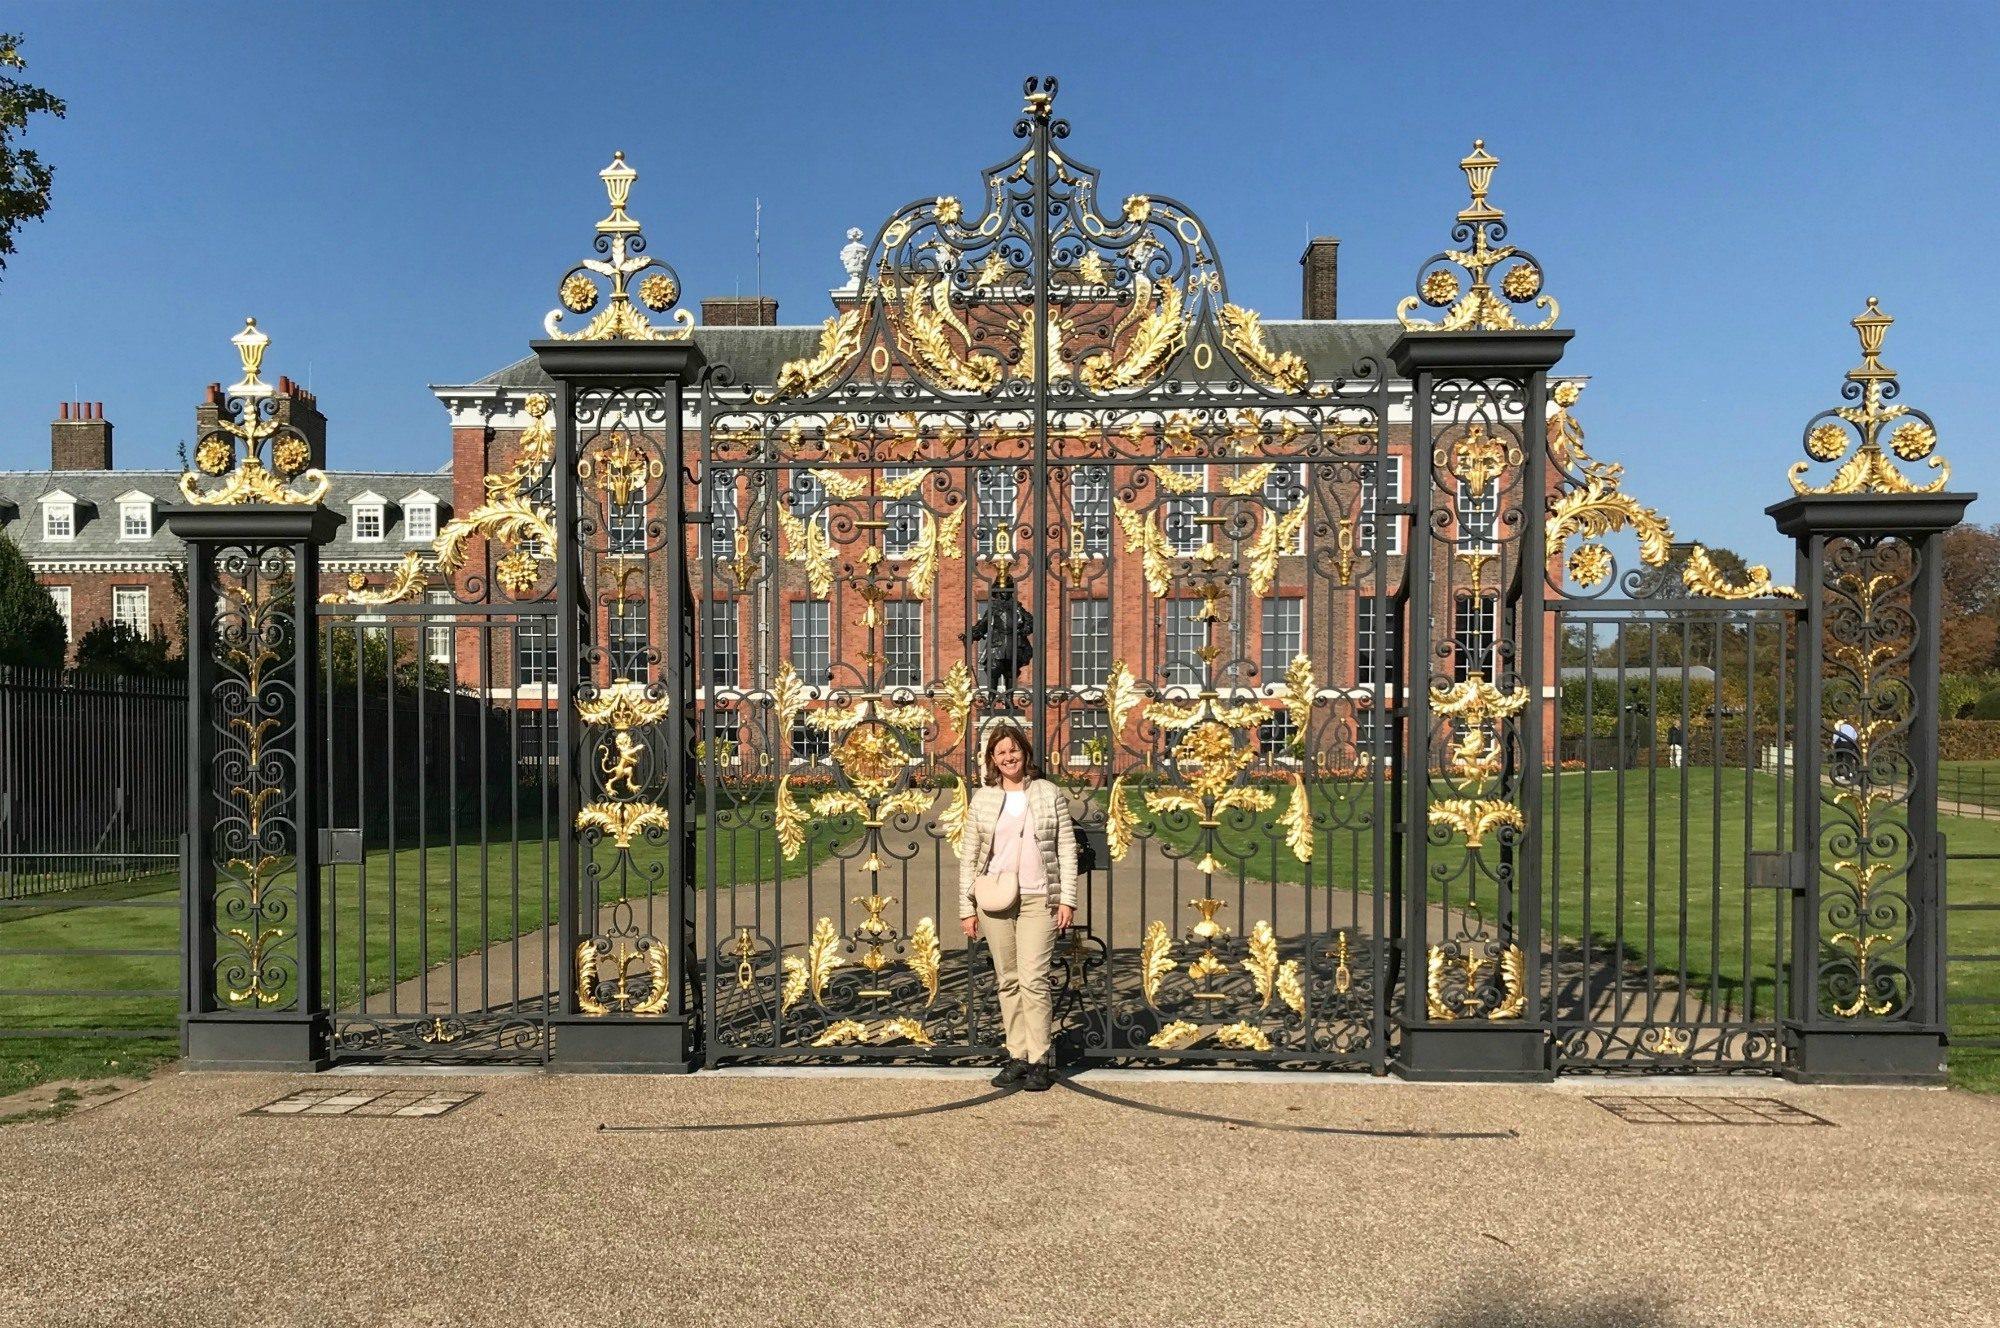 Wrought Iron gates of Kensington Palace, London